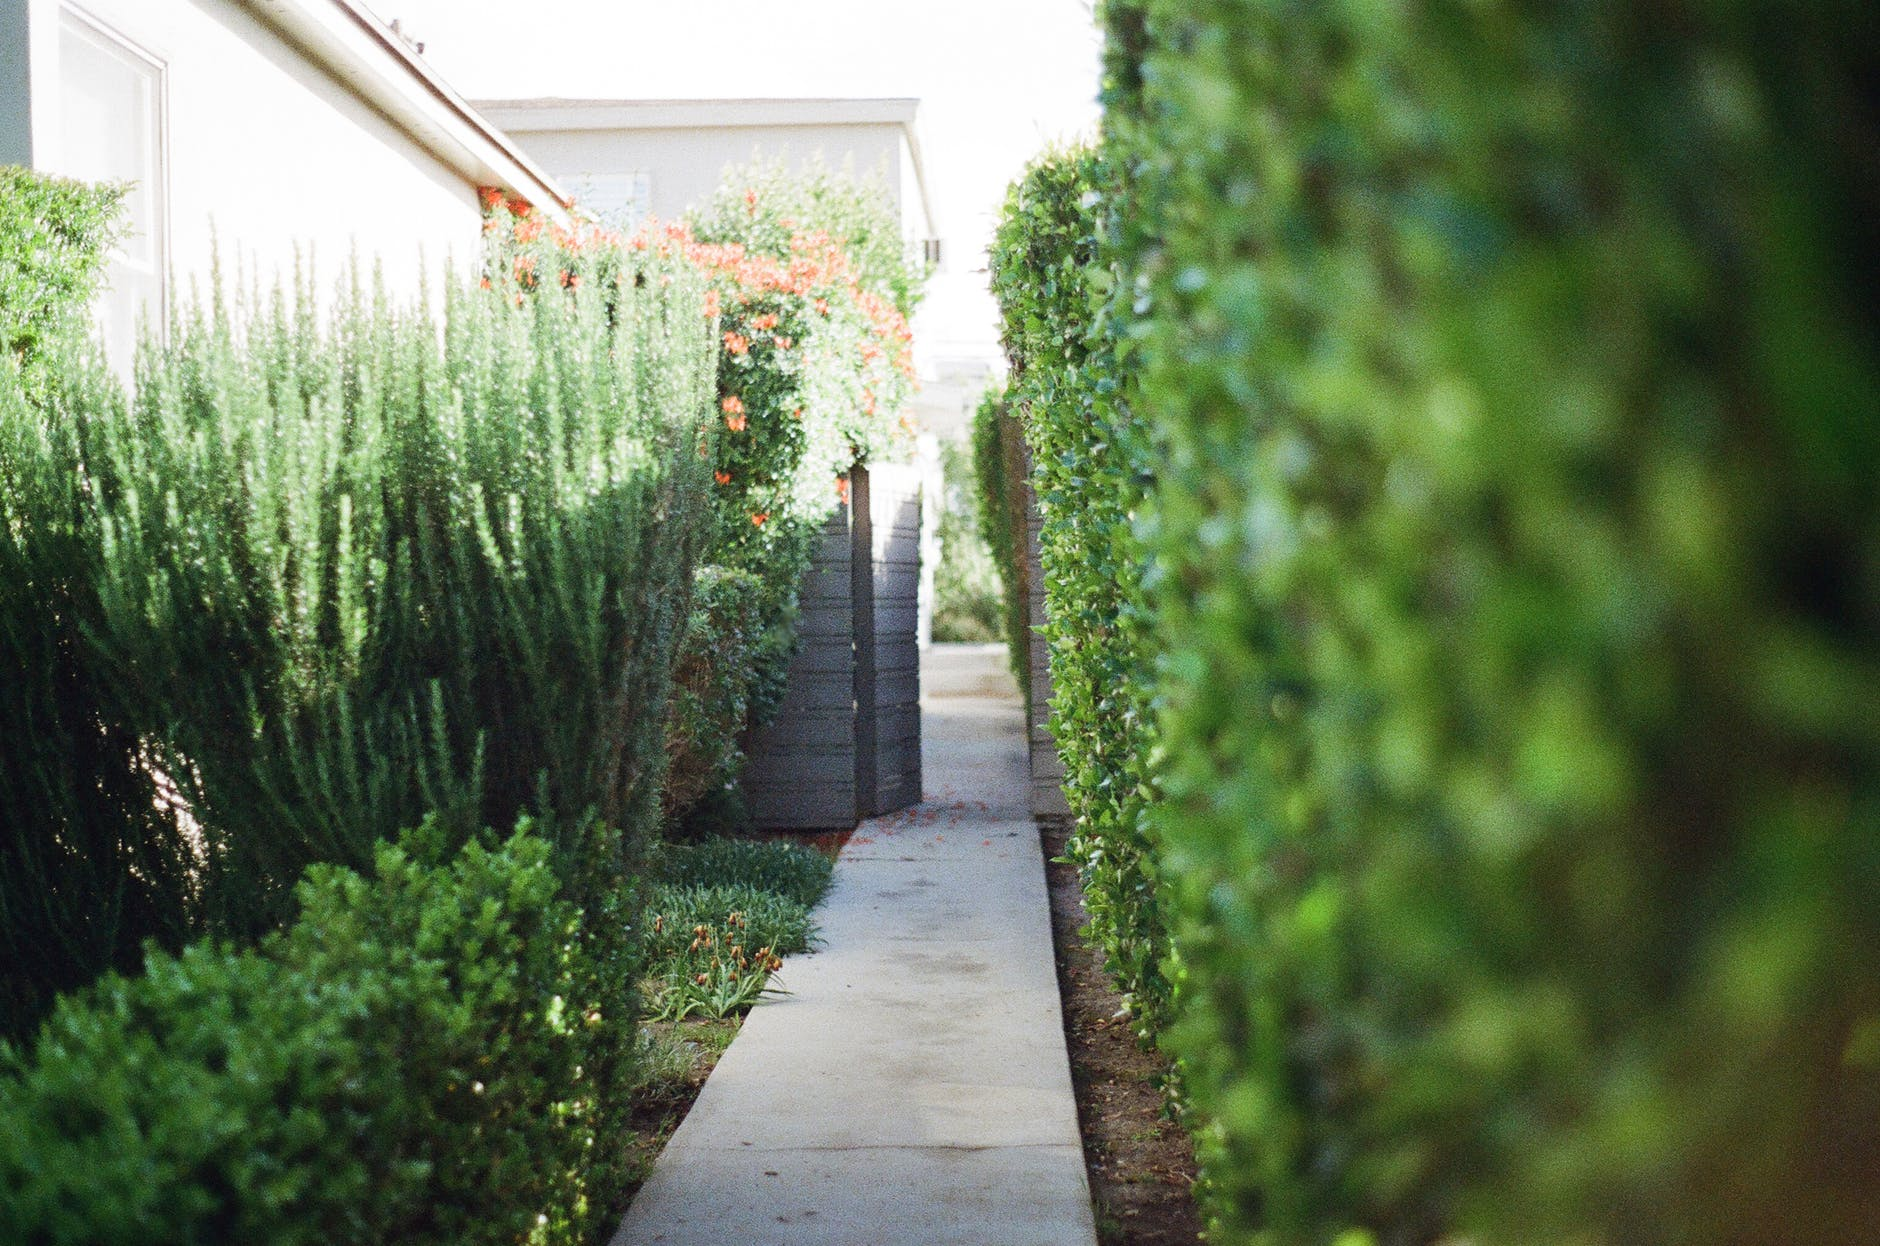 gardens are hotspots